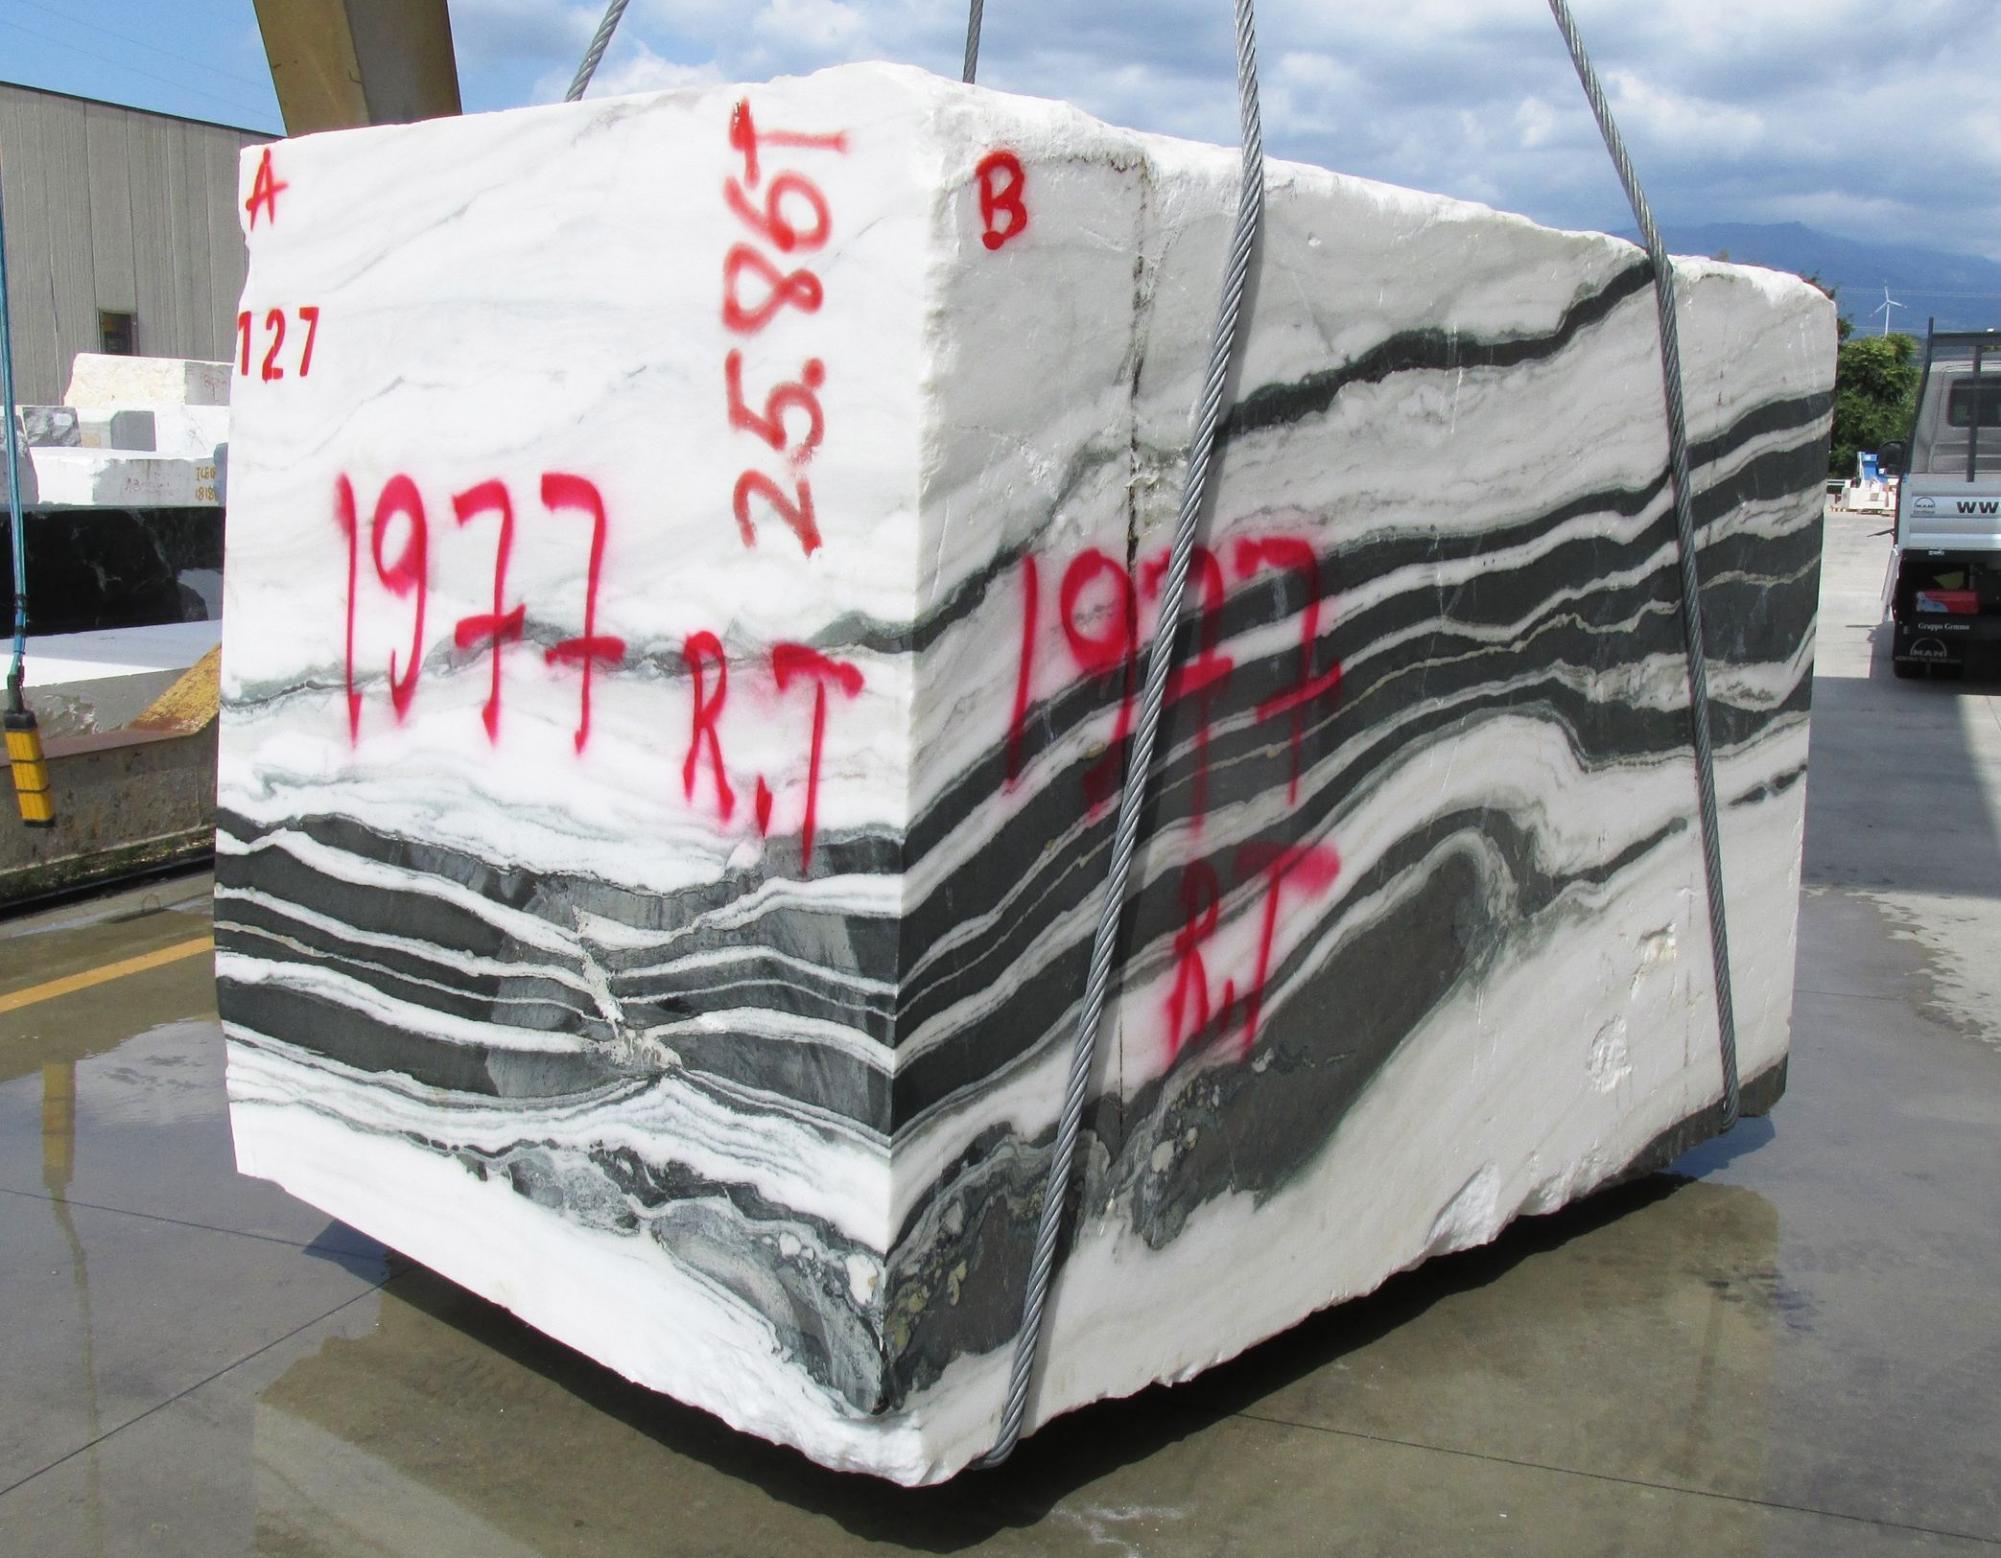 PANDA rohe Blöcke 1771M aus Natur Marmor , Face A: Lieferung Veneto, Italien